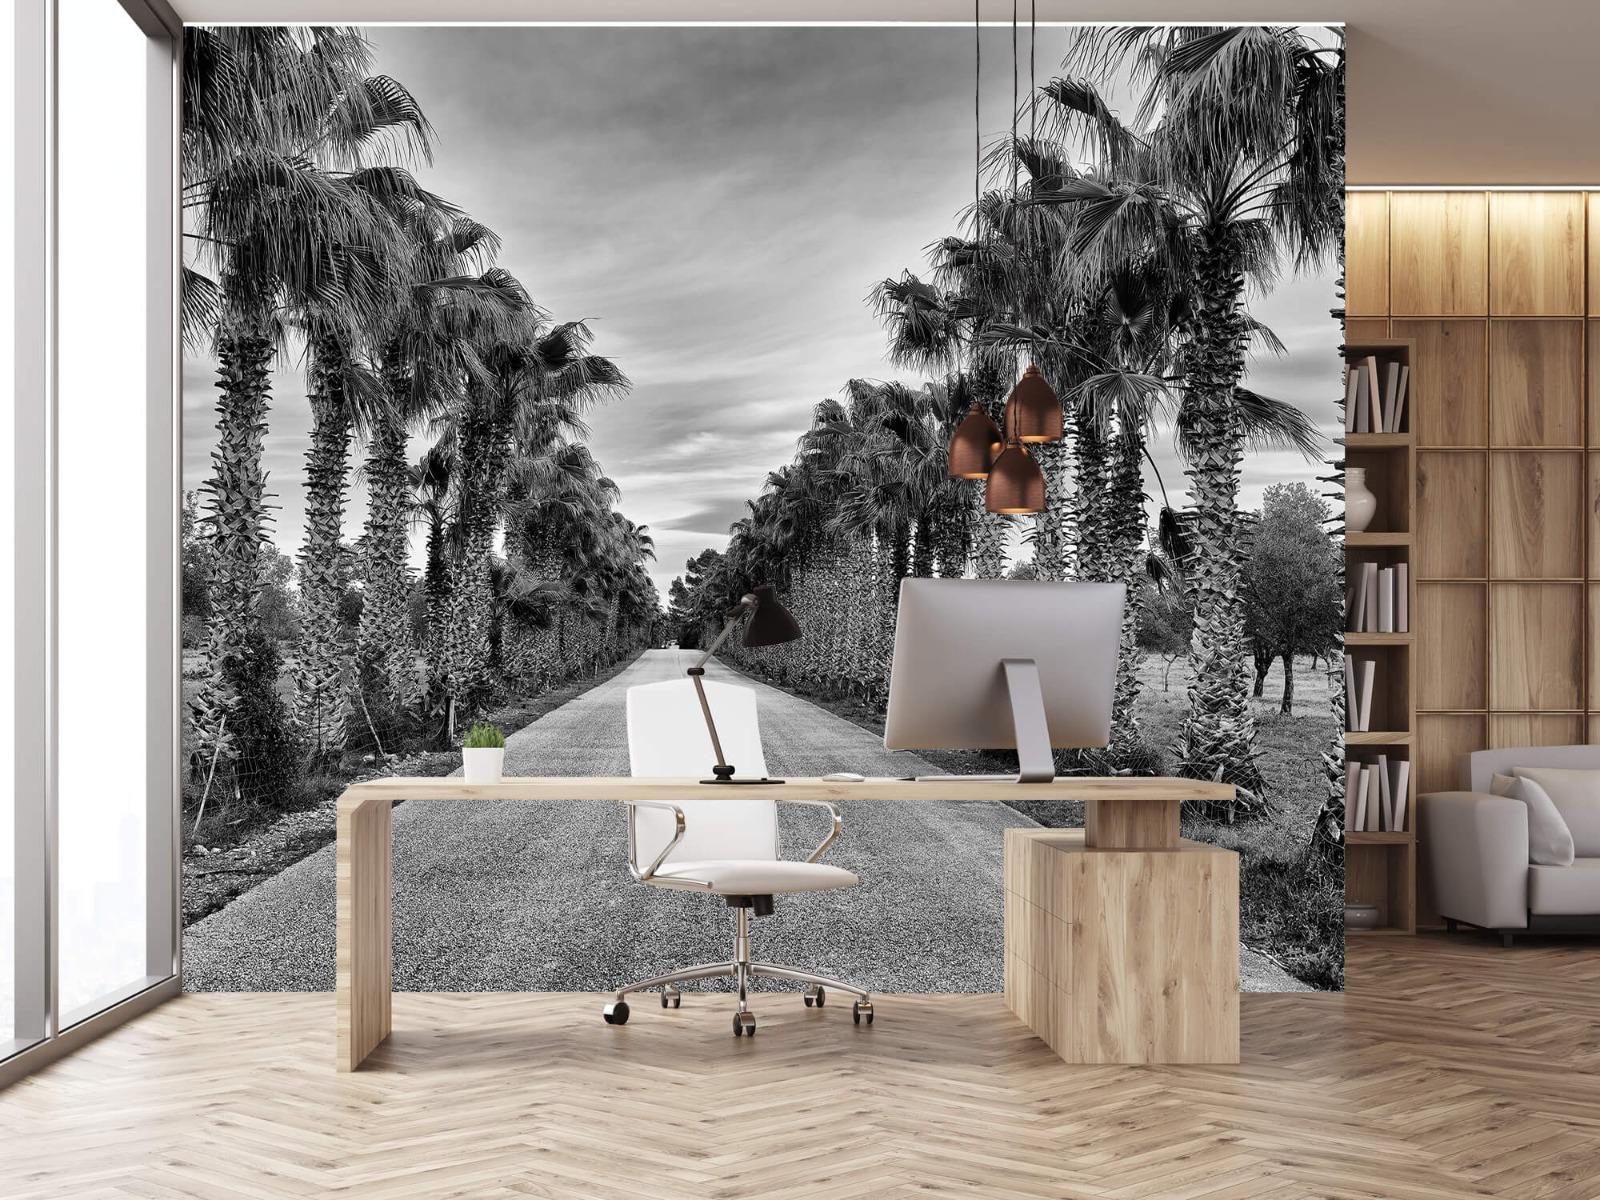 Palmbomen - Straat met palmbomen - Woonkamer 24